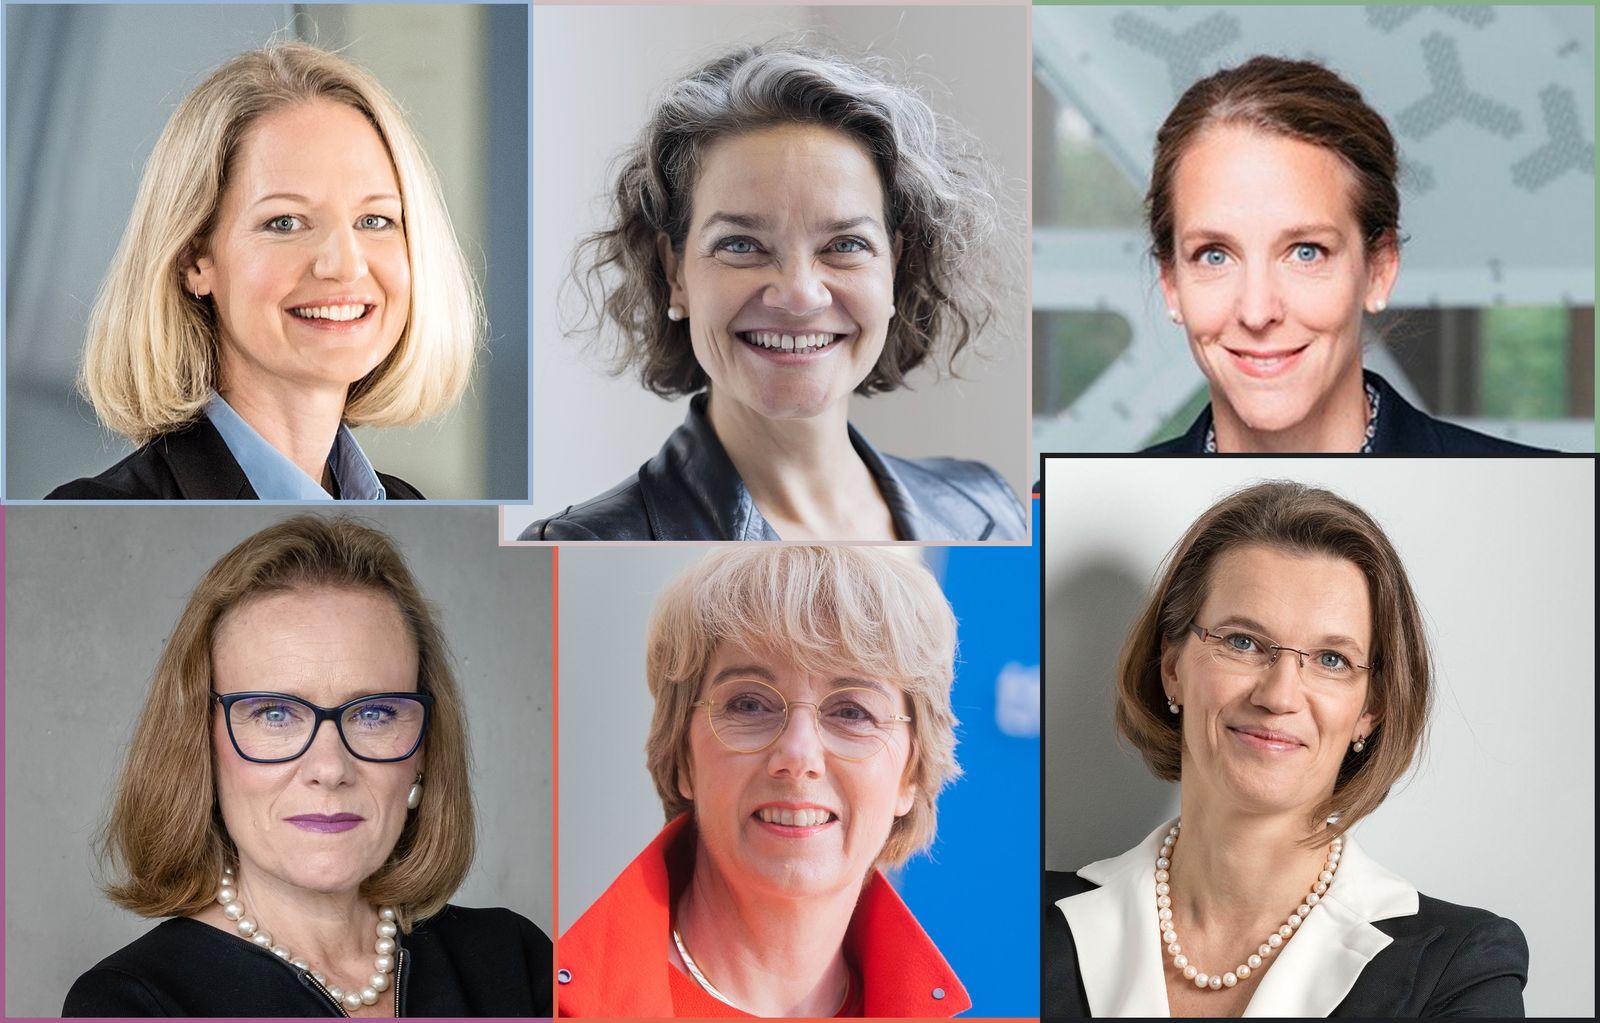 KOMBO Frauen 2020 / Anna Maria Braun / Claudia Nemat / Finja Carolin Kütz / Belen Garijo / Martina Merz / Britta Fünfstück